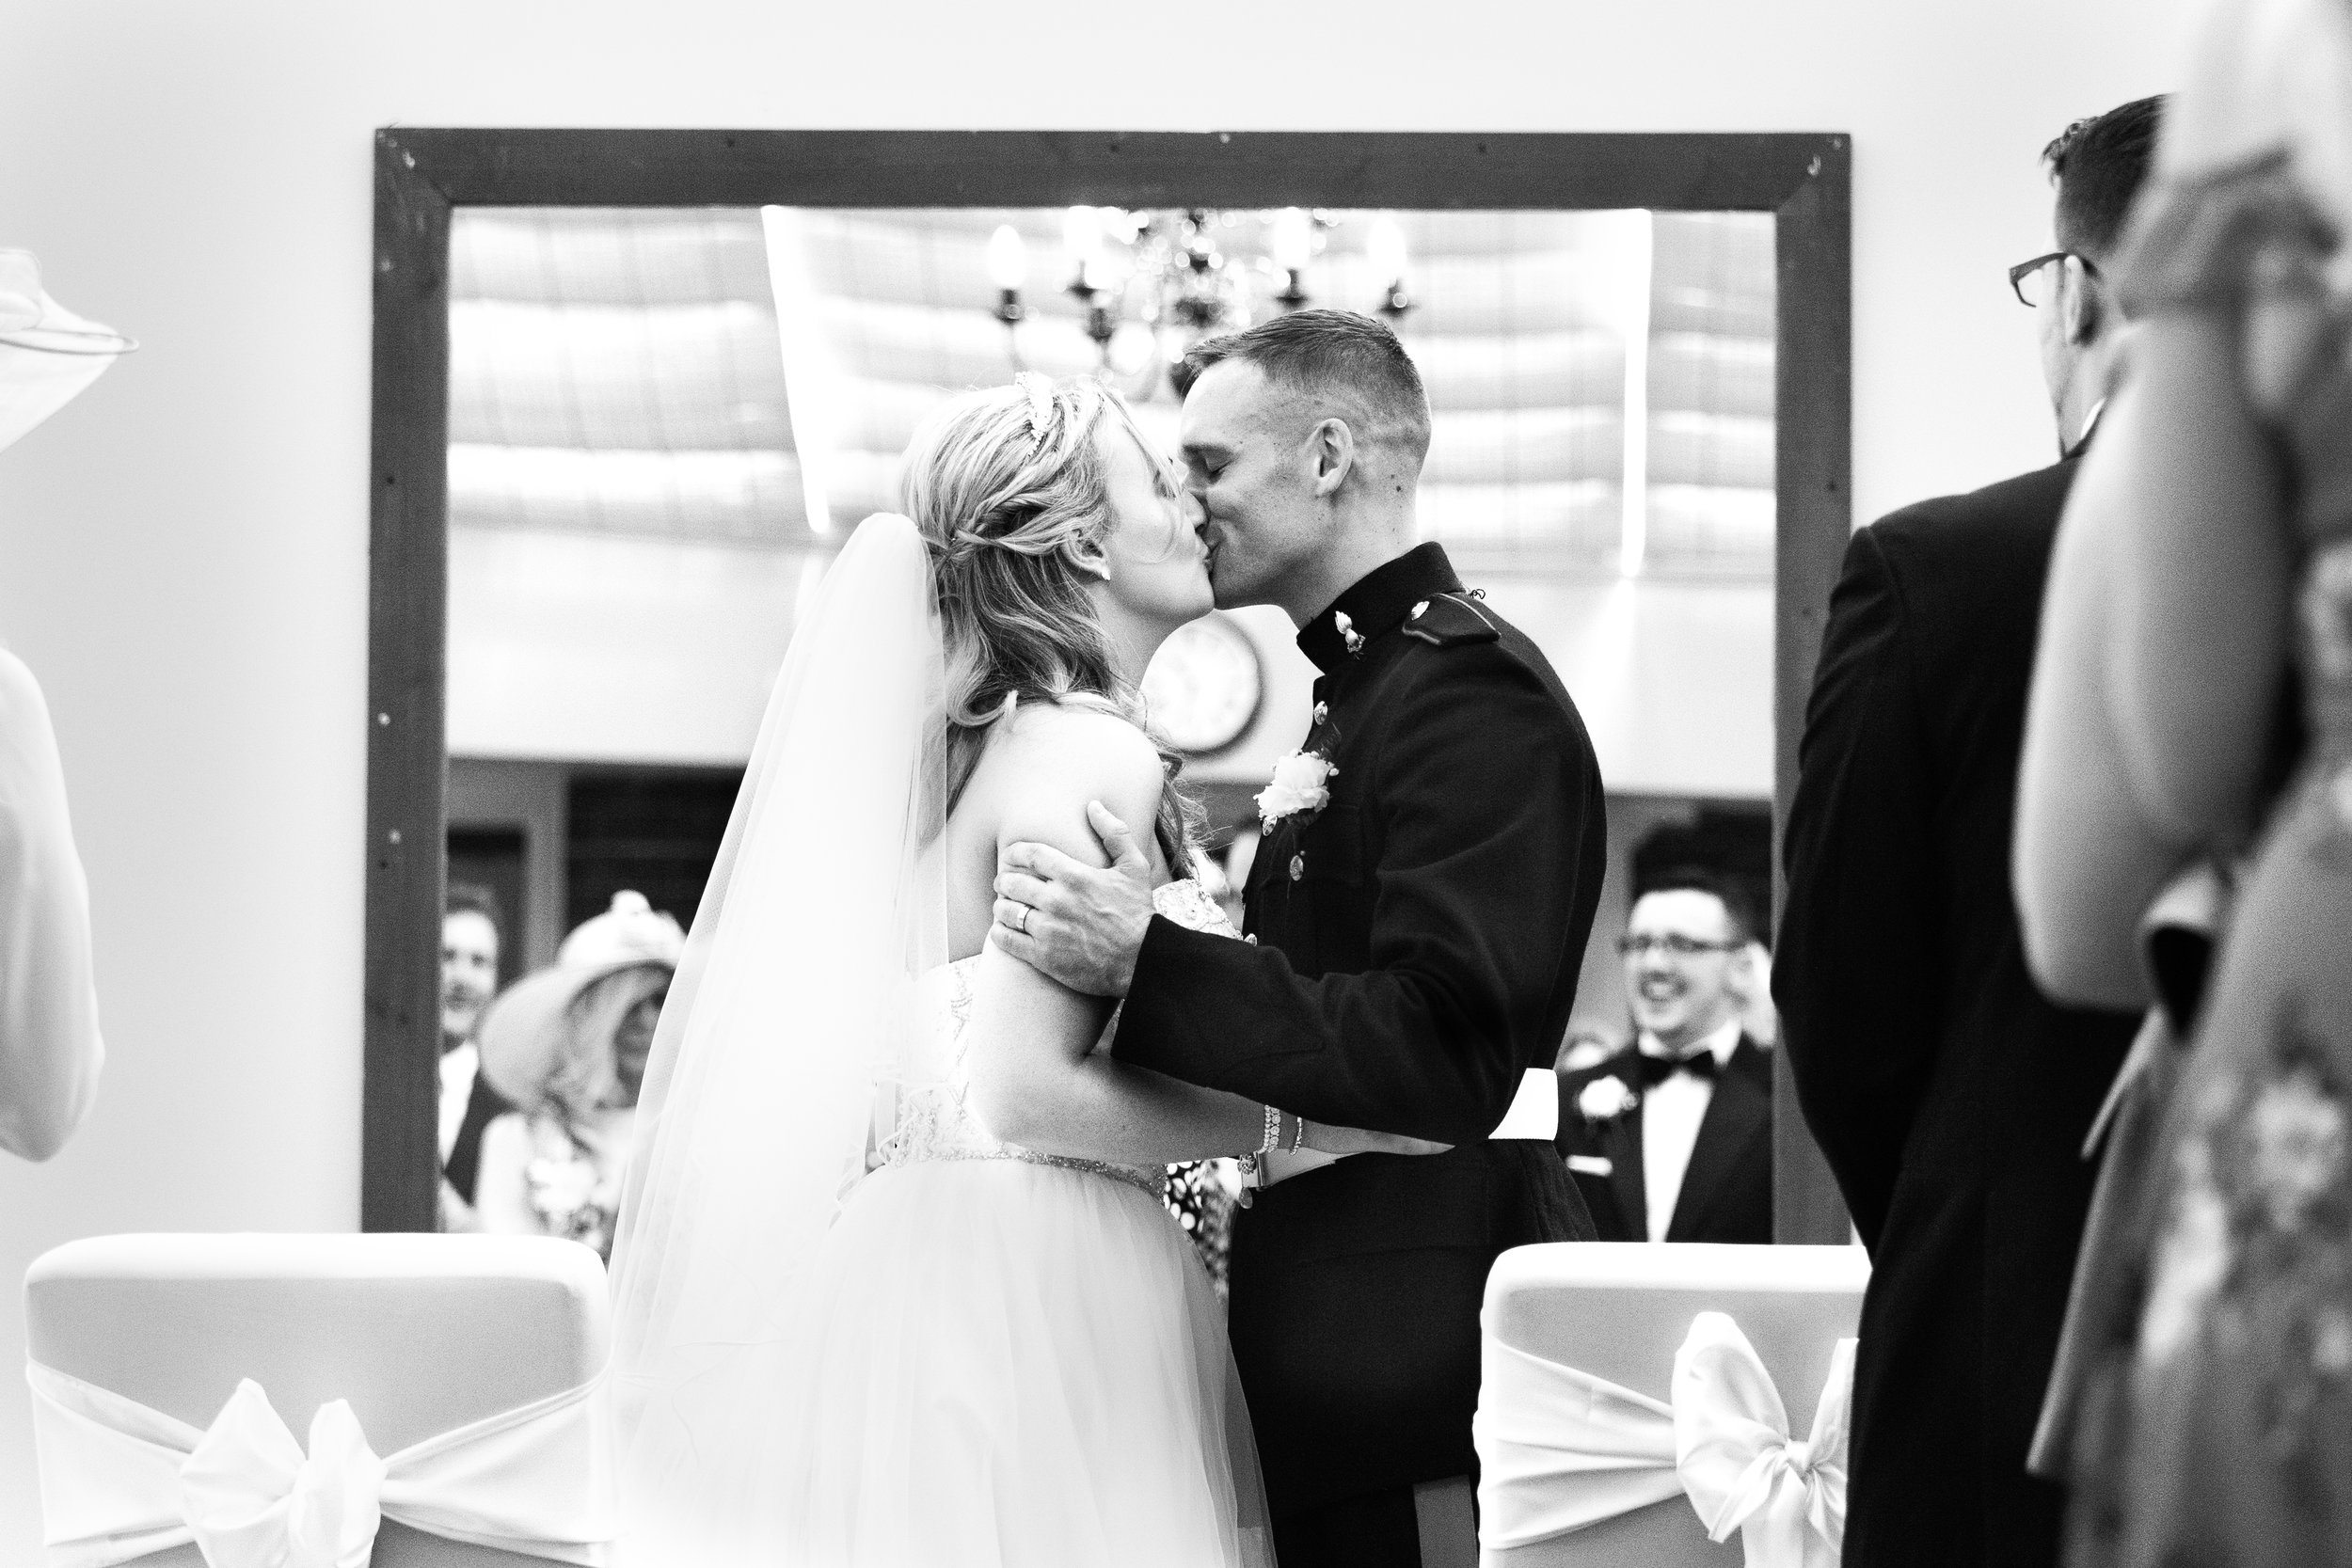 wedding-lea-cooper-photography-willenhall-west-midlands-wolverhampton-dudley-birmingham-uk-marriage-hadley-park-east-telford-first-kiss